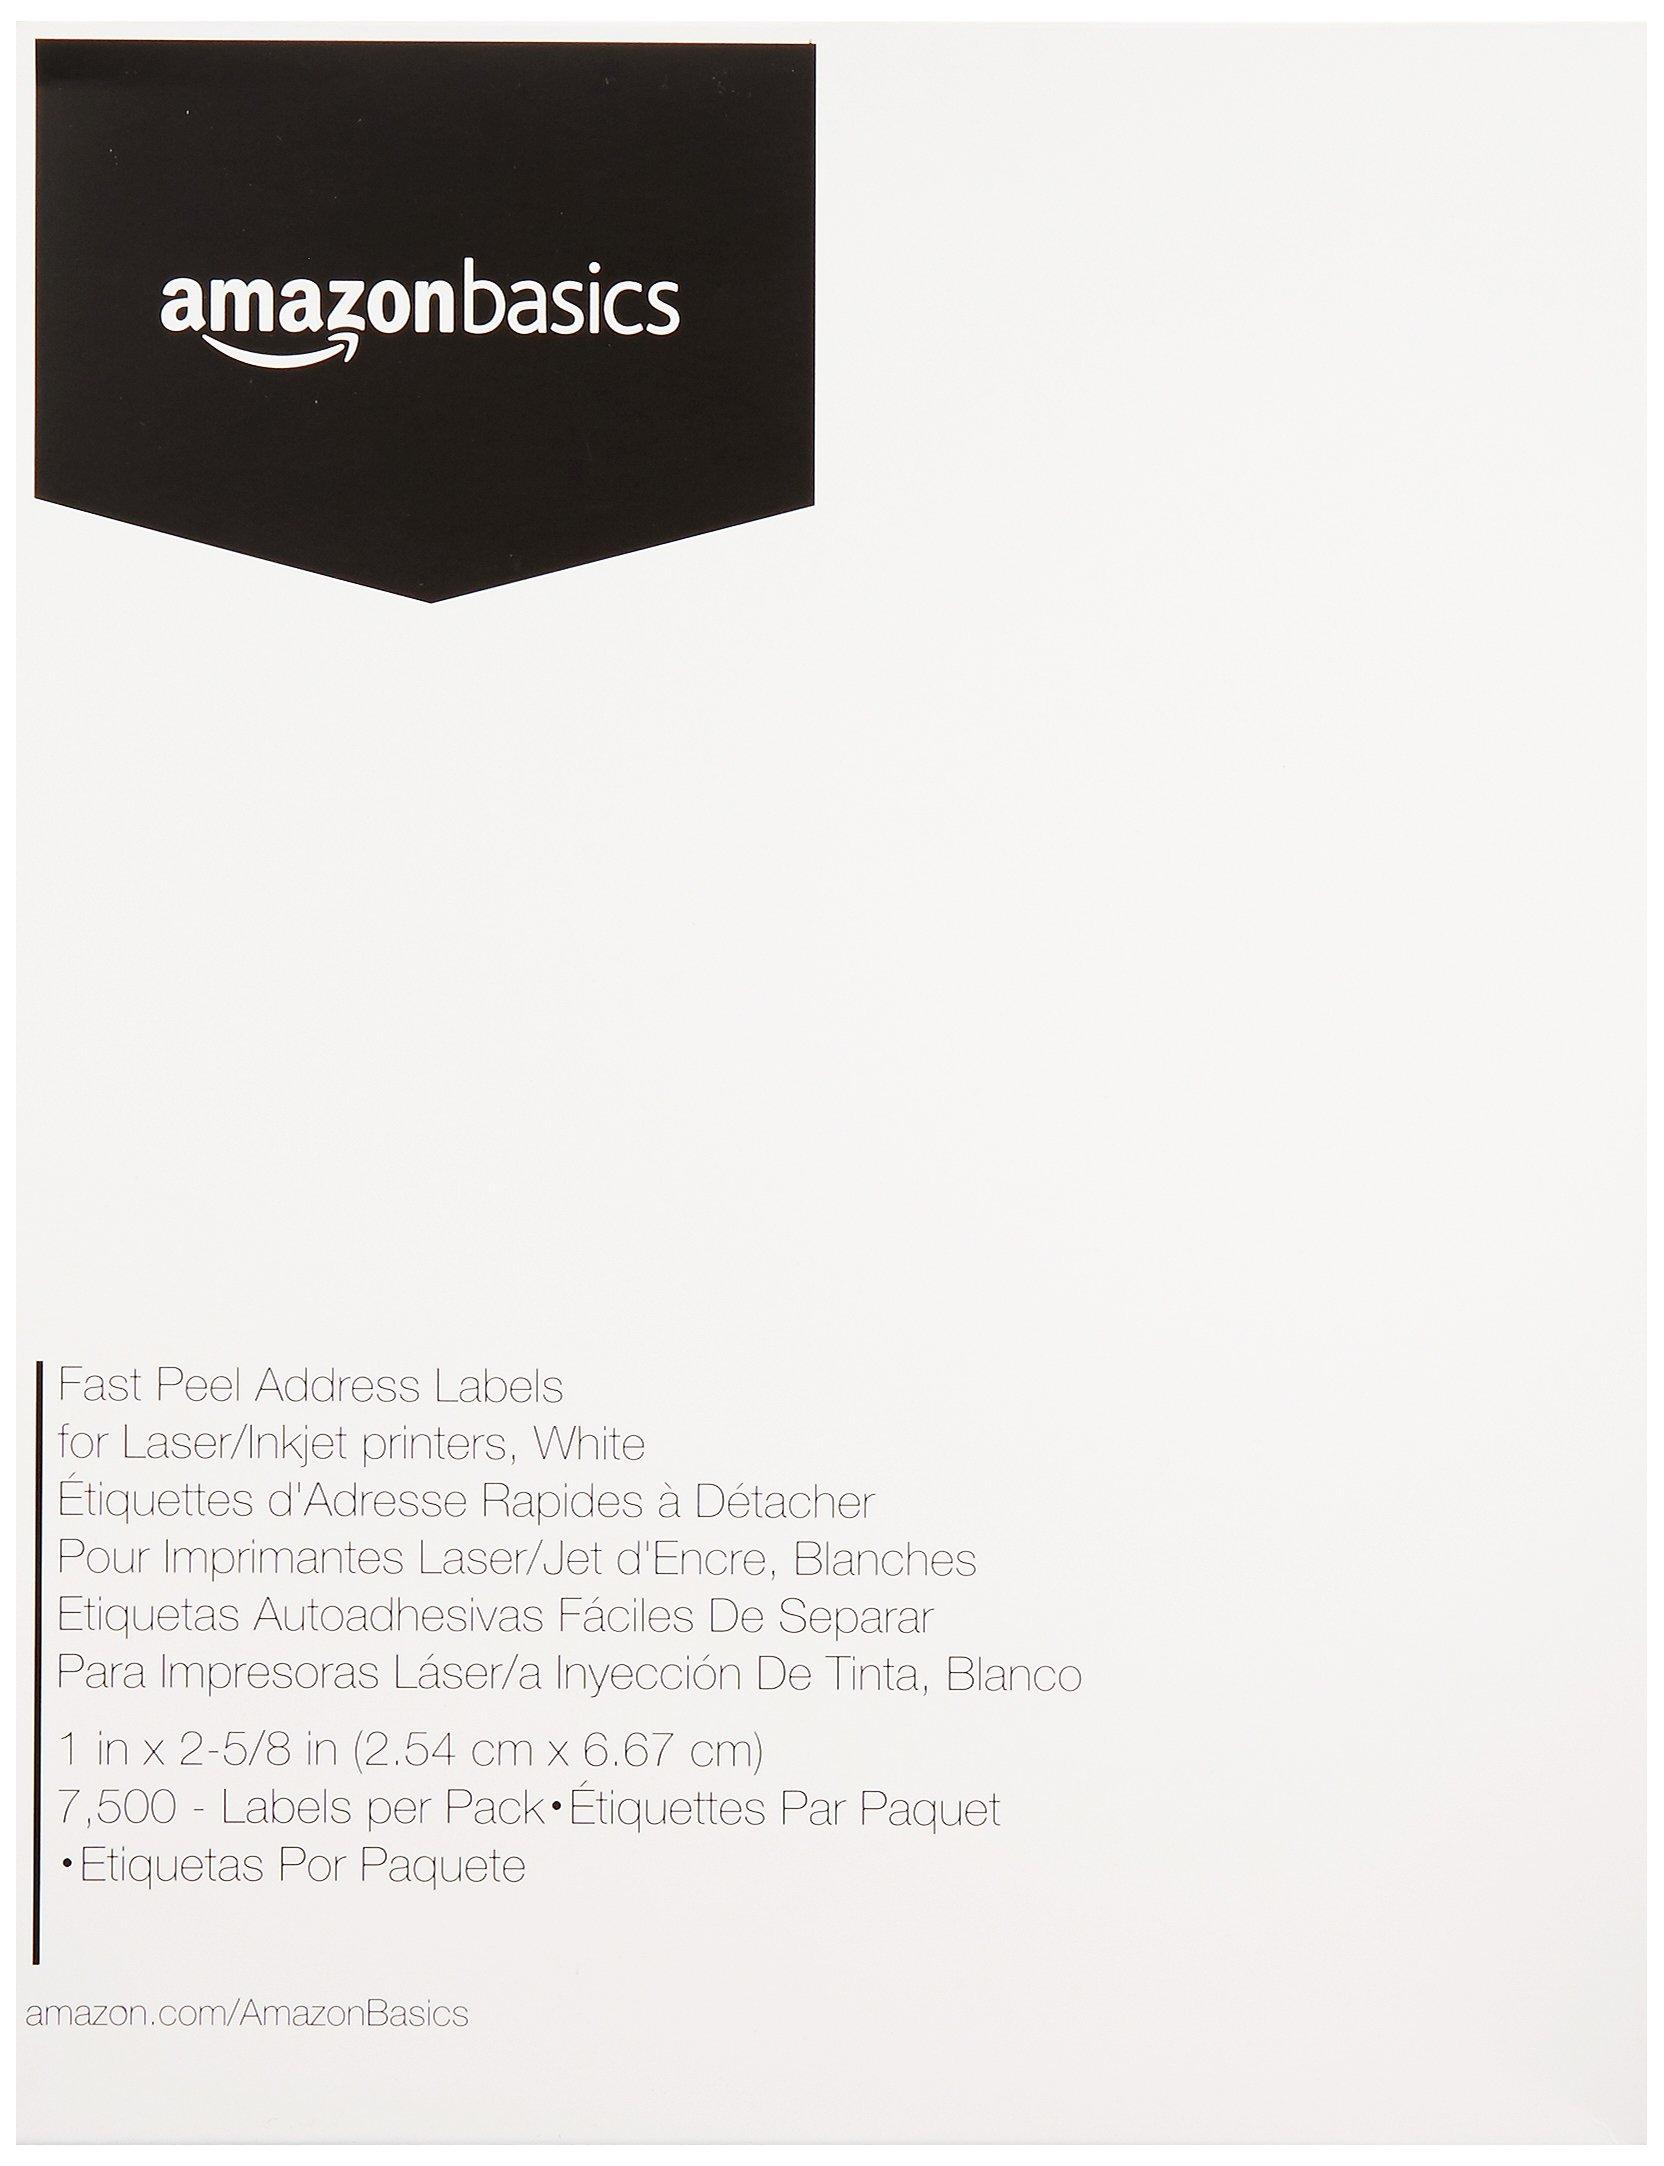 Amazon Basics Fast Peel Address Labels for Laser/Inkjet Printers, White, 1 x 2-5/8 Inch Label, 1 Pack, 7,500 Labels